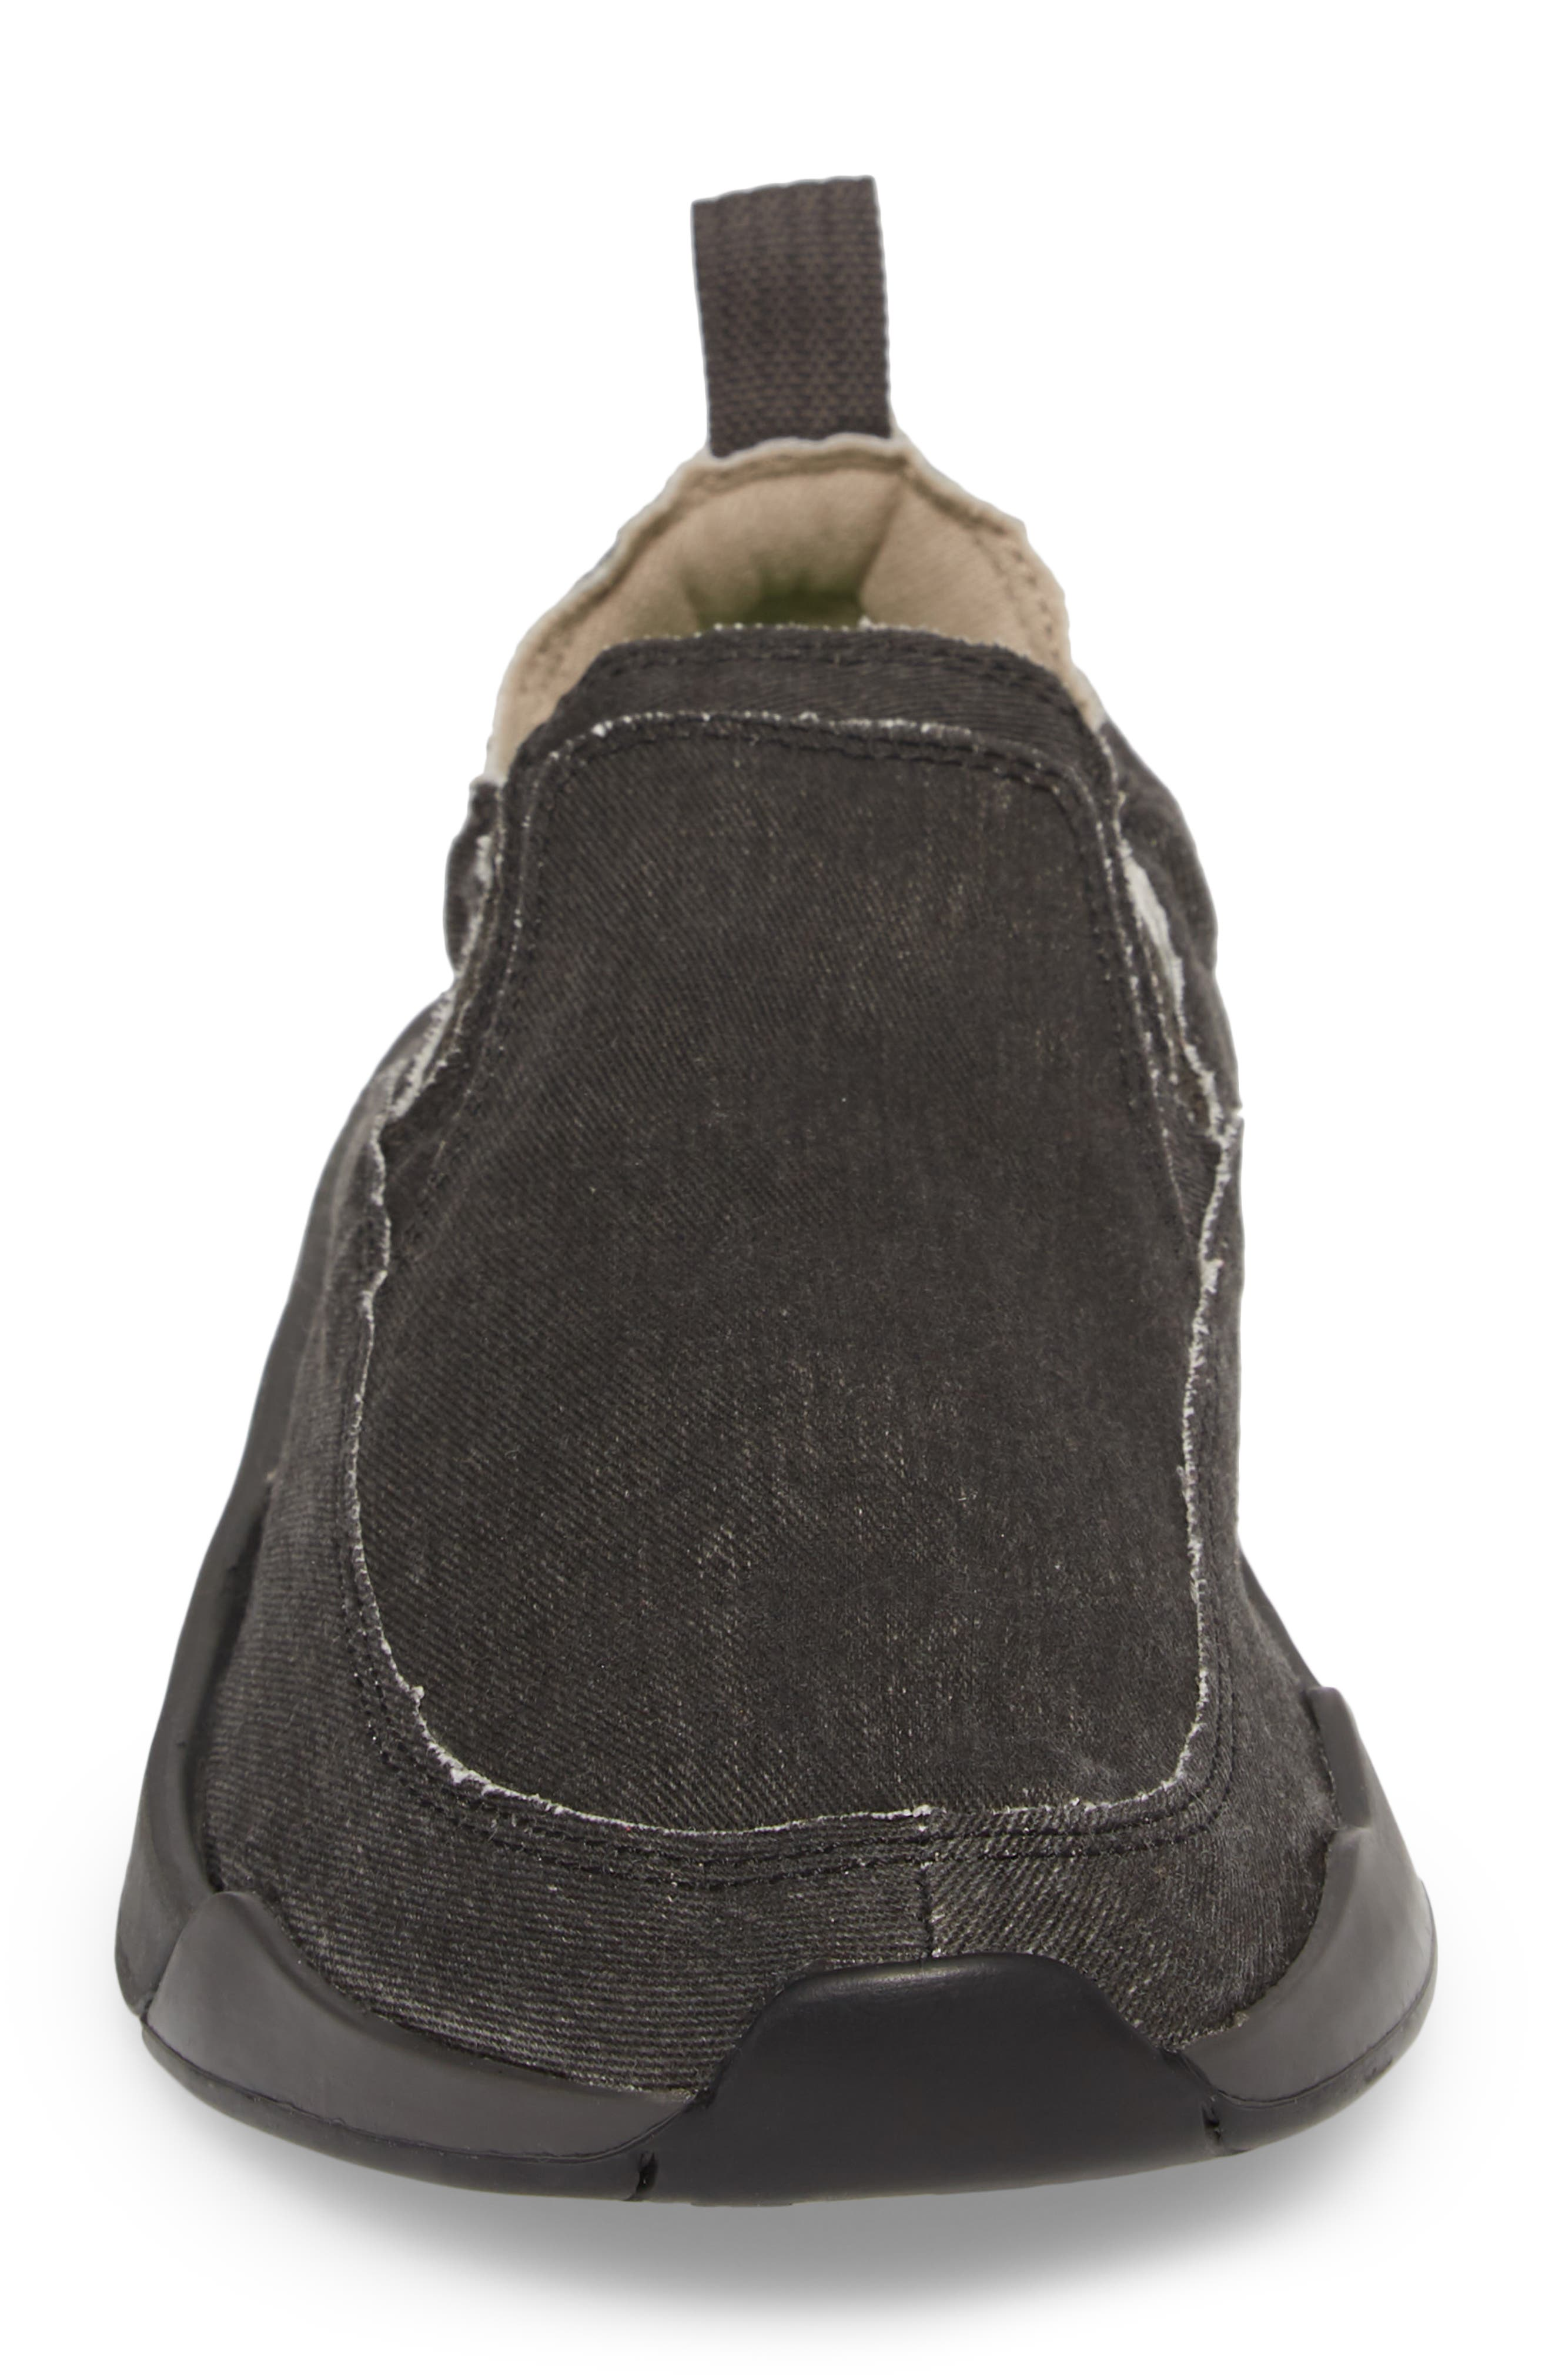 Chiba Quest Slip-On Sneaker,                             Alternate thumbnail 5, color,                             Black/ Black